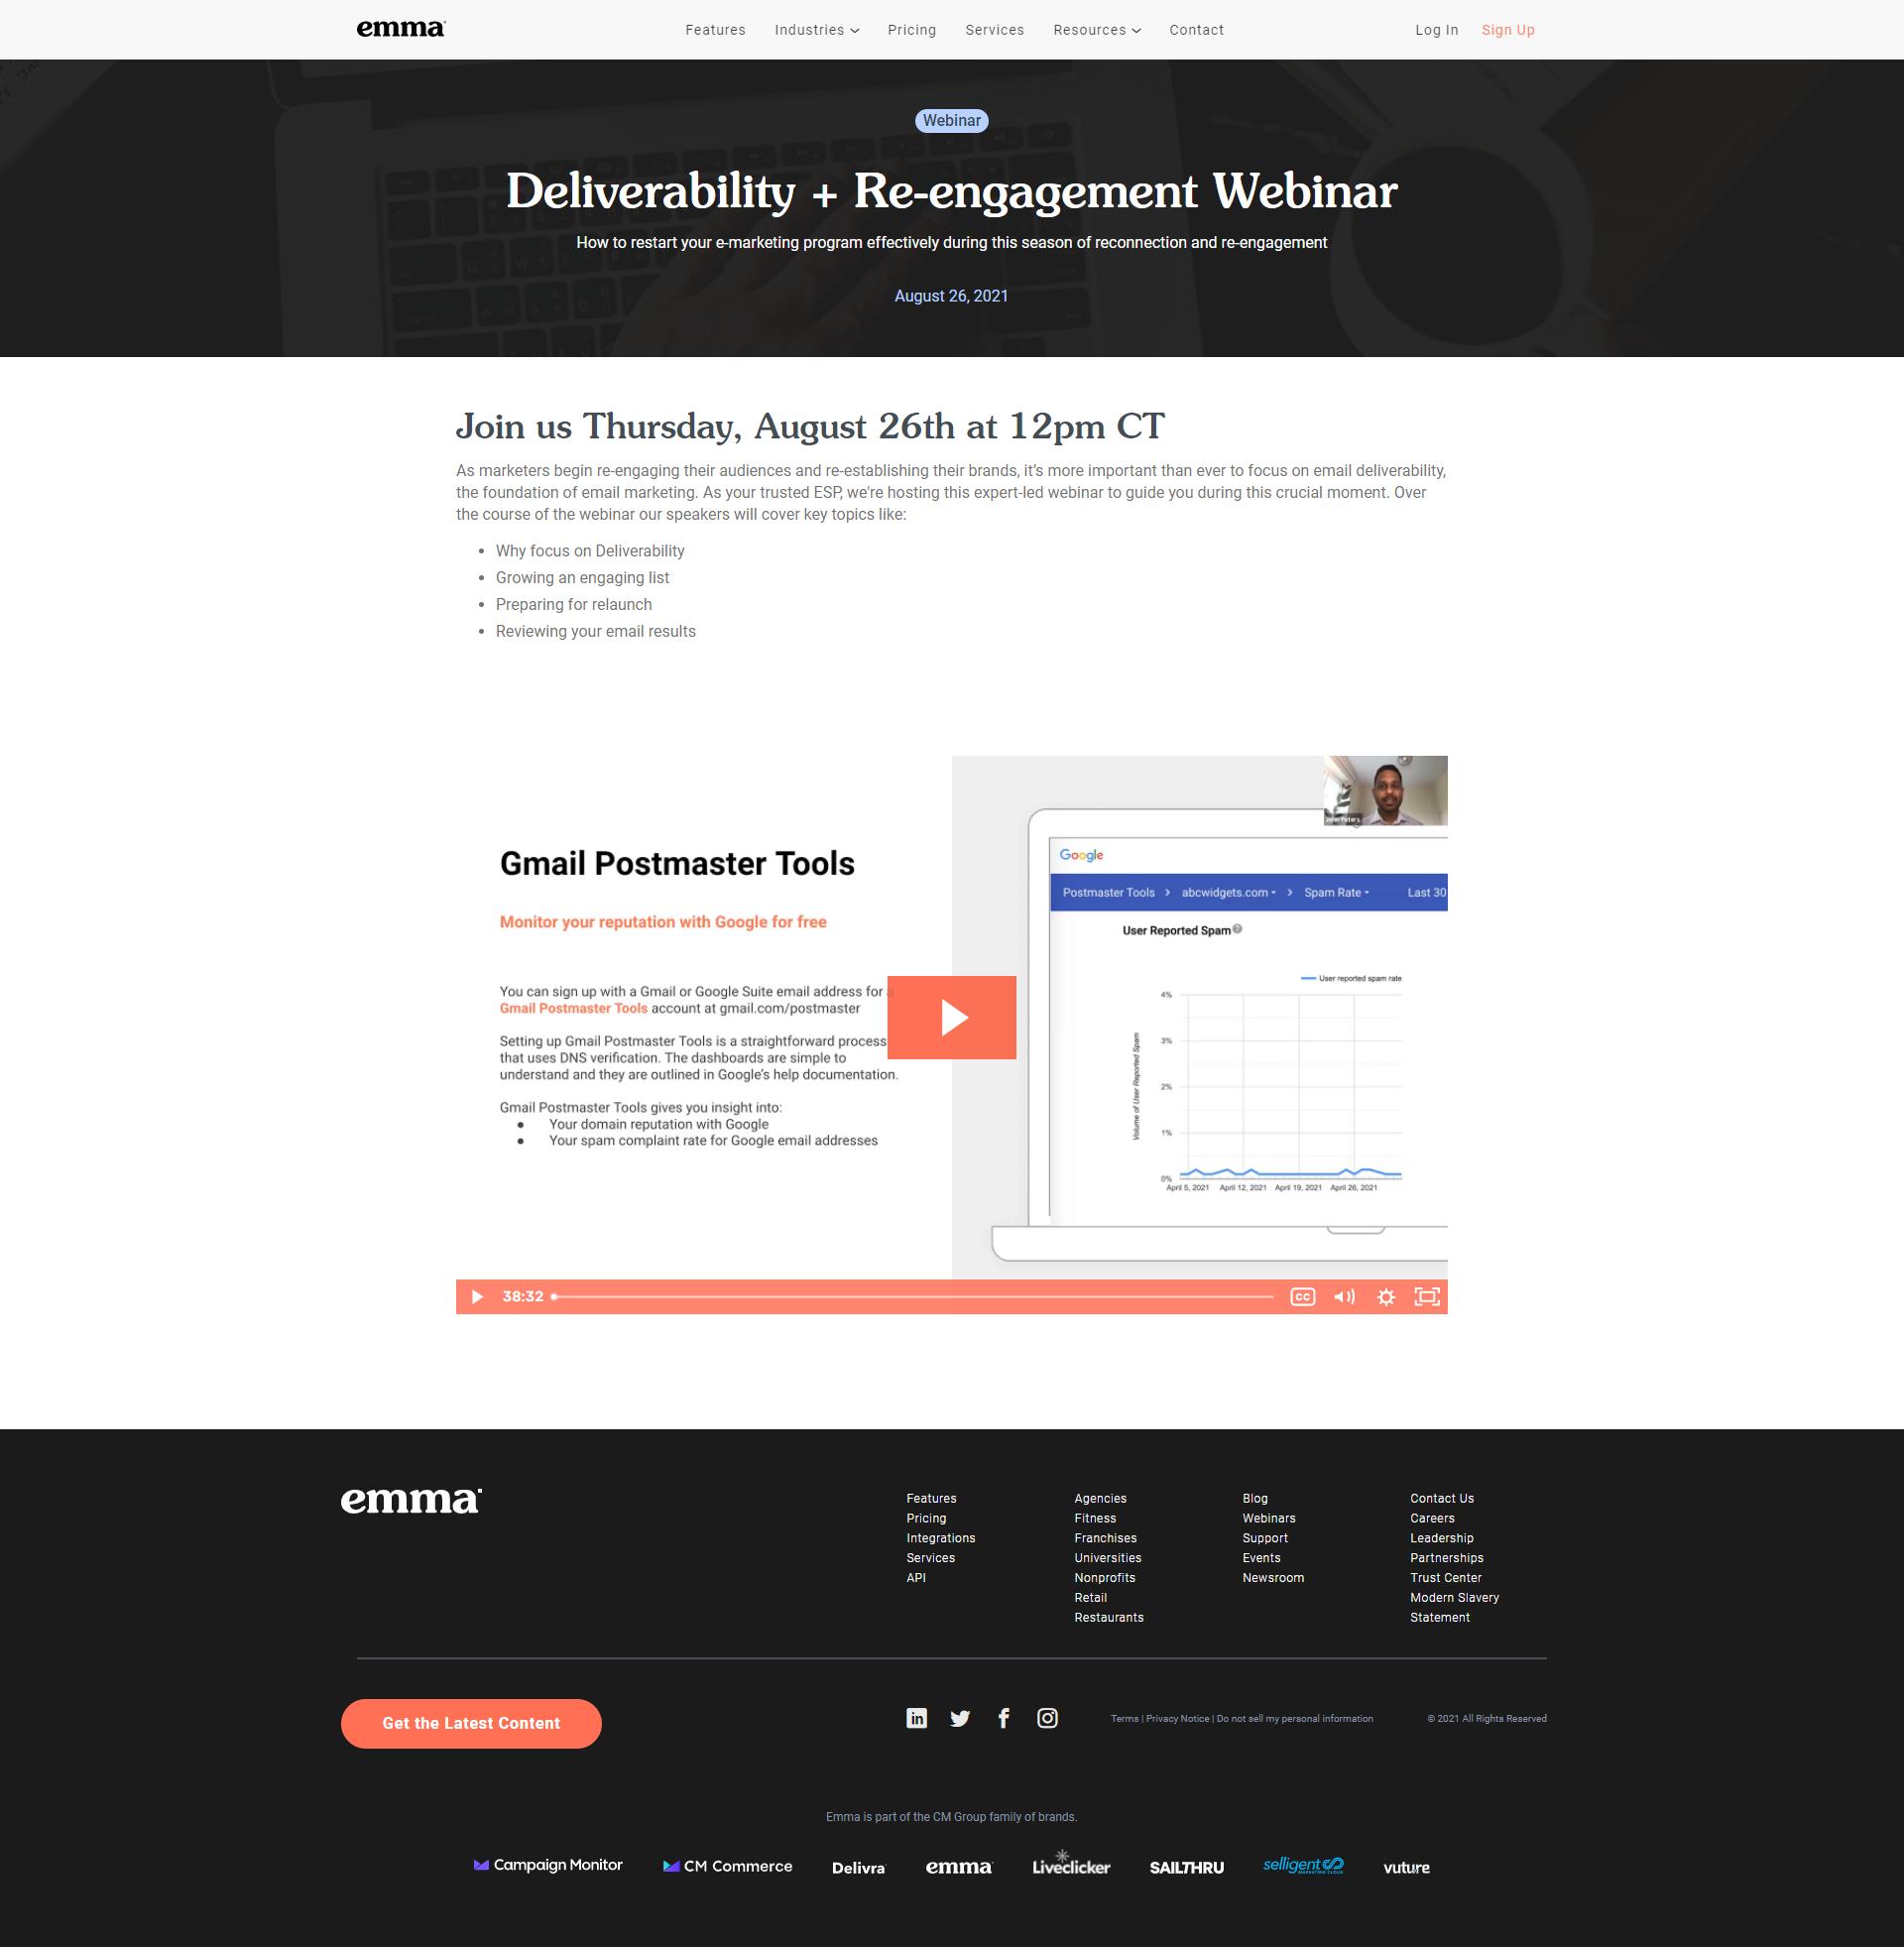 emma Web page example